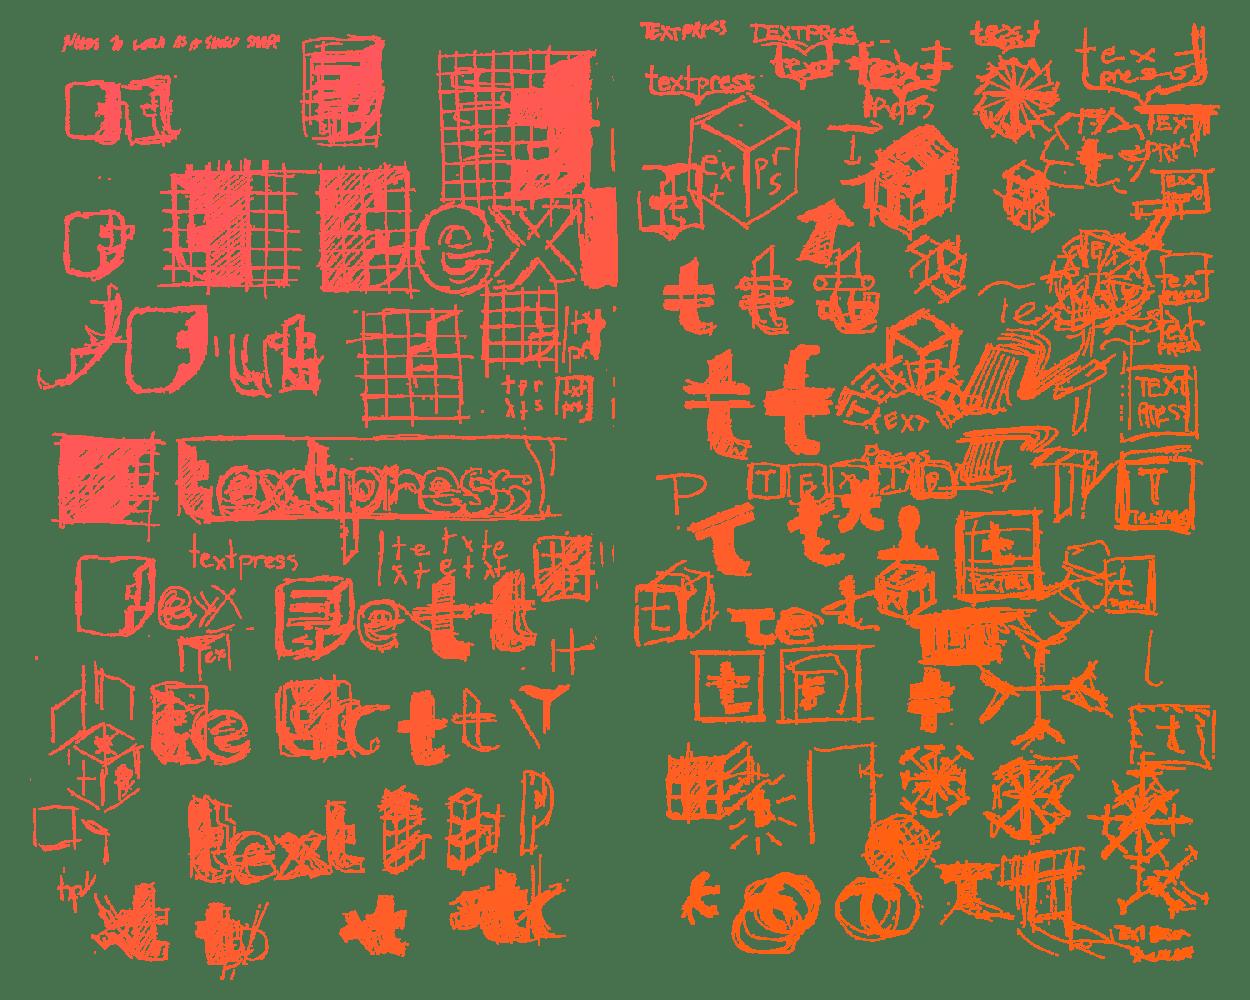 Sketch concepts for the Textpress logo